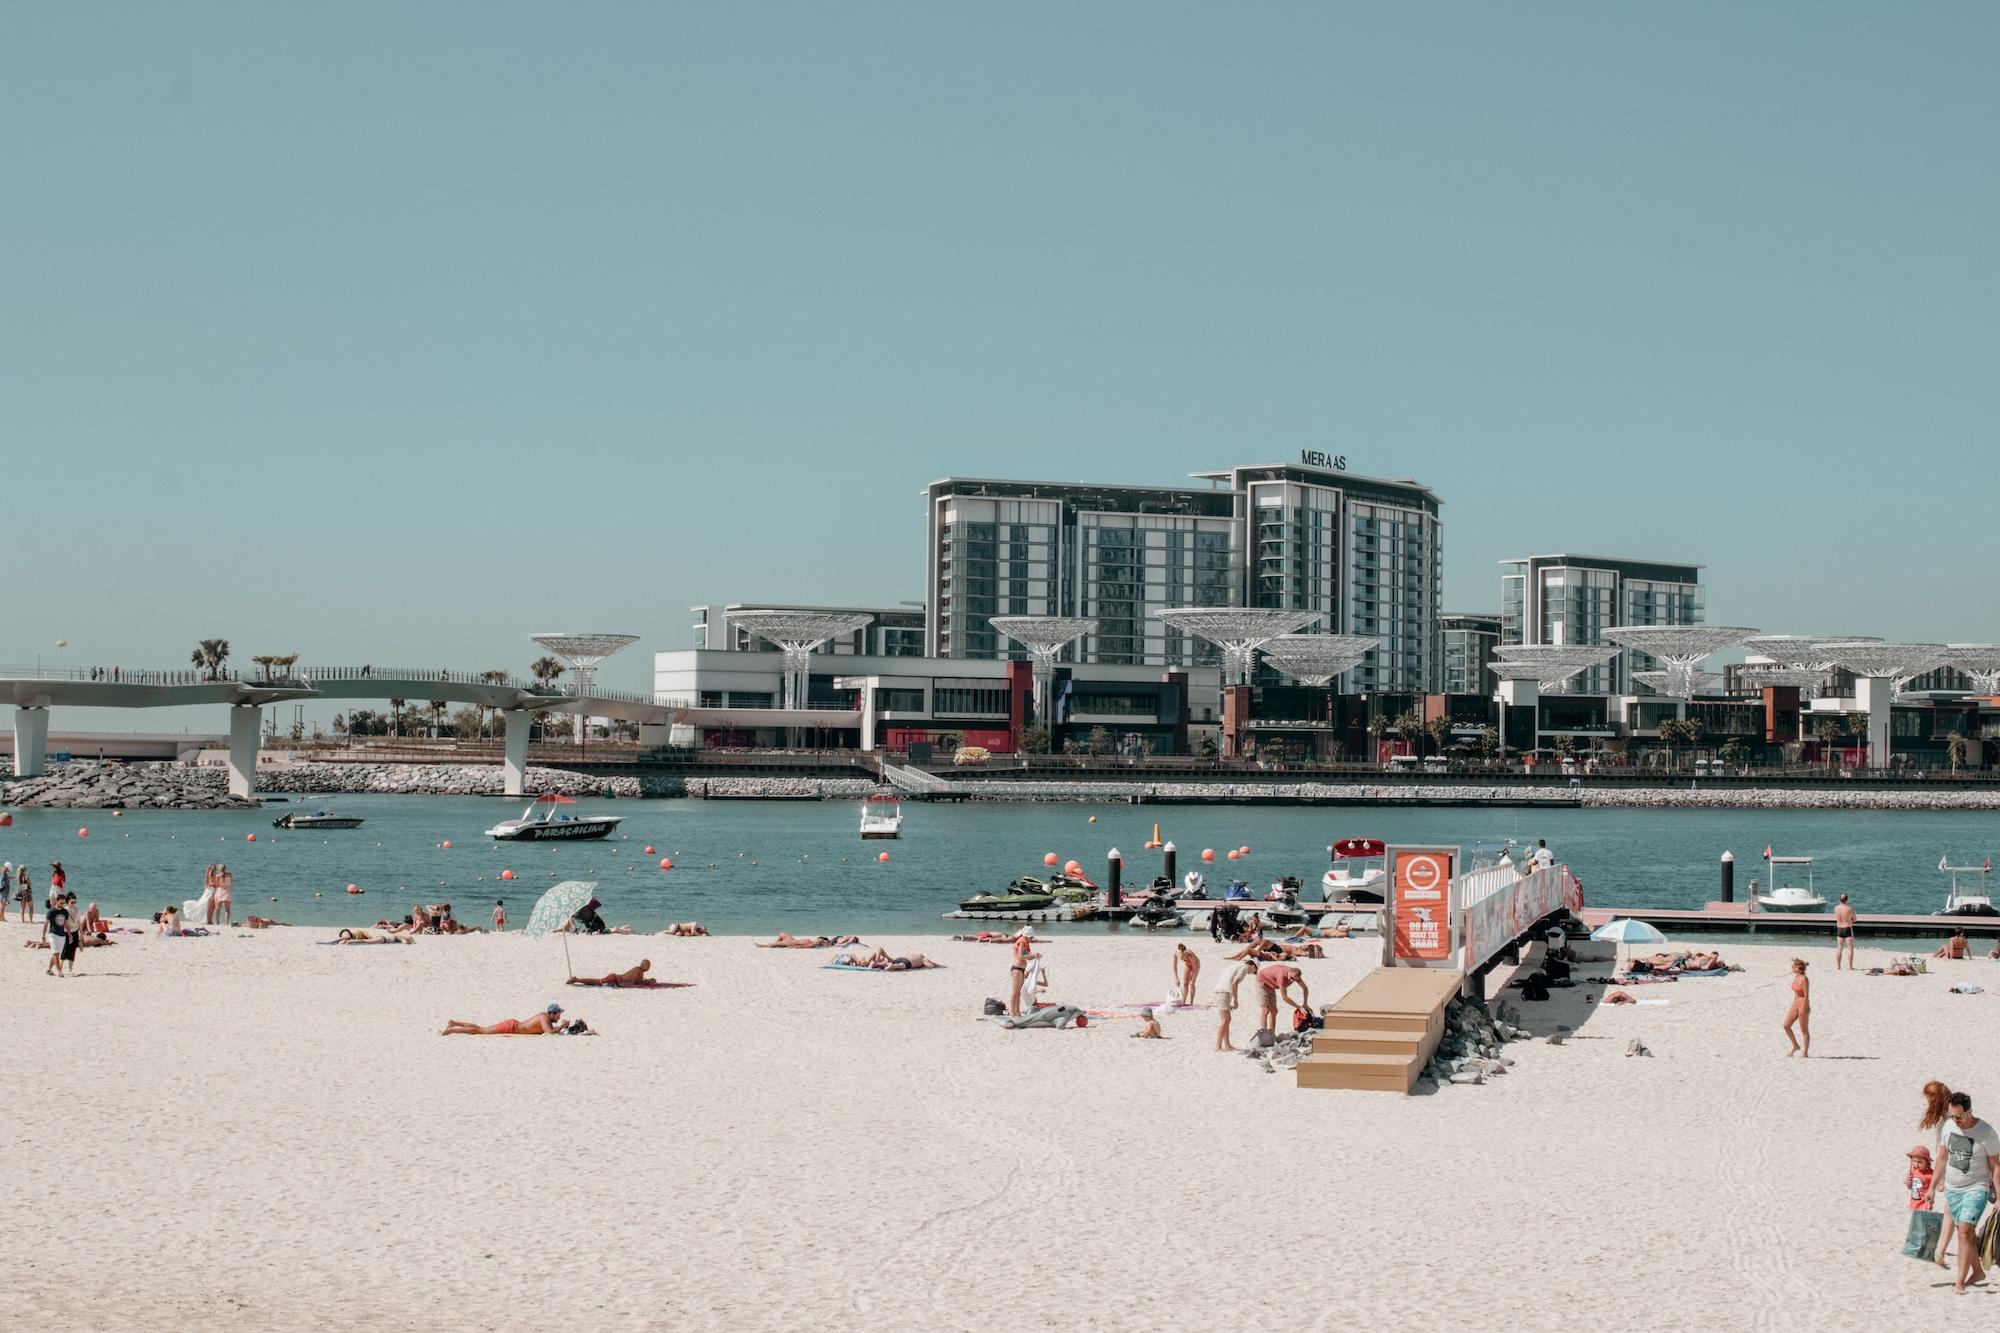 jbr beach marina dubai